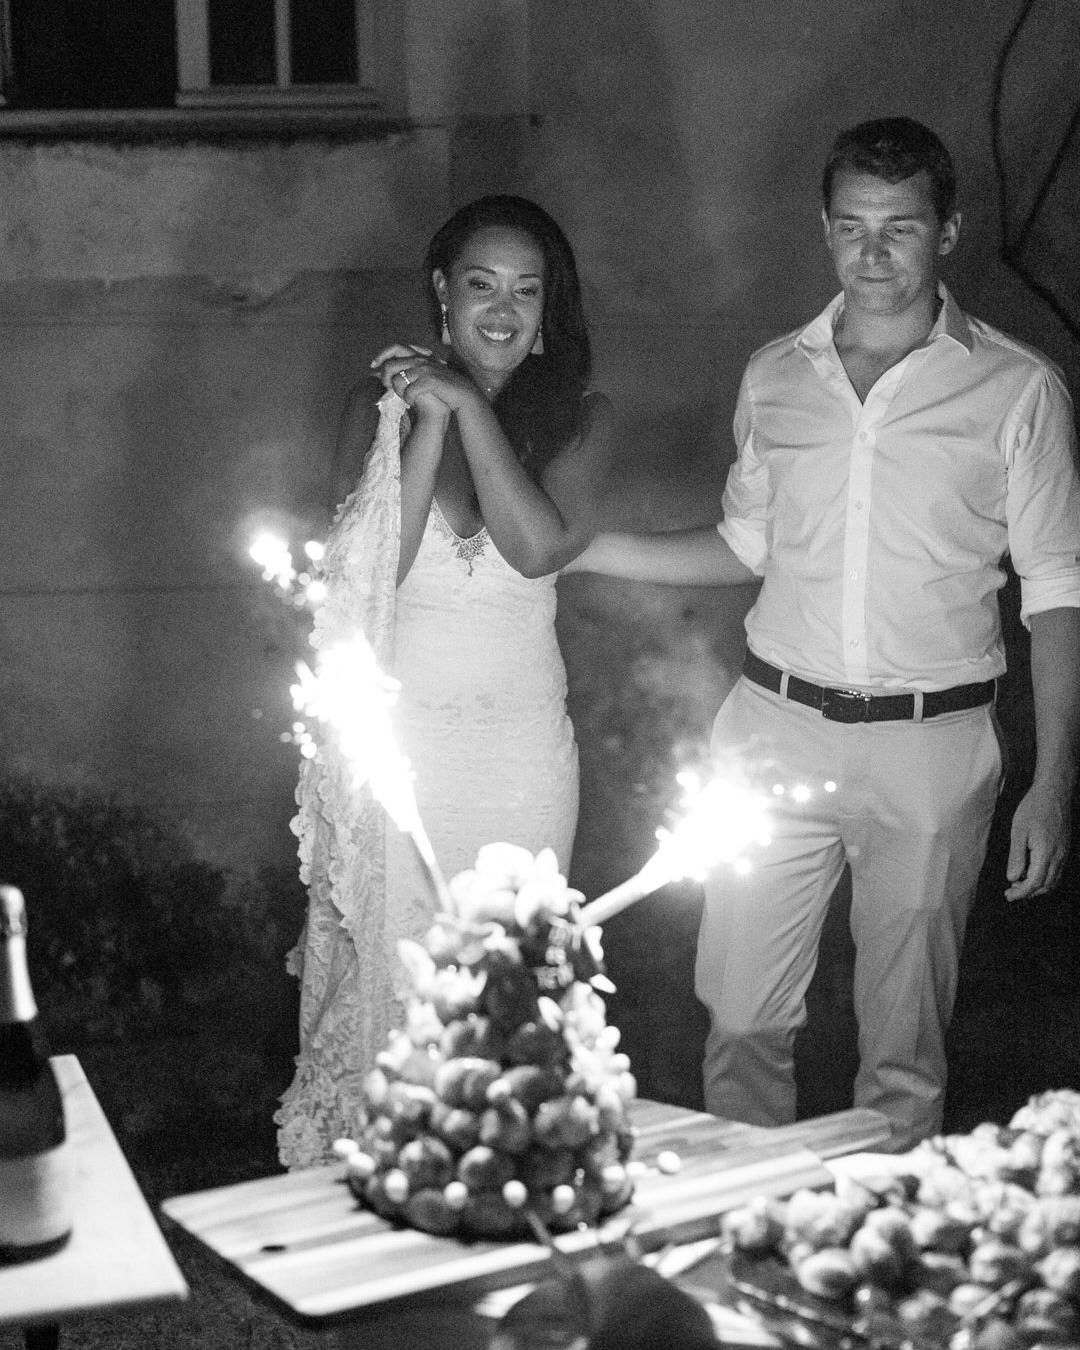 jen tim wedding croq with sparklers